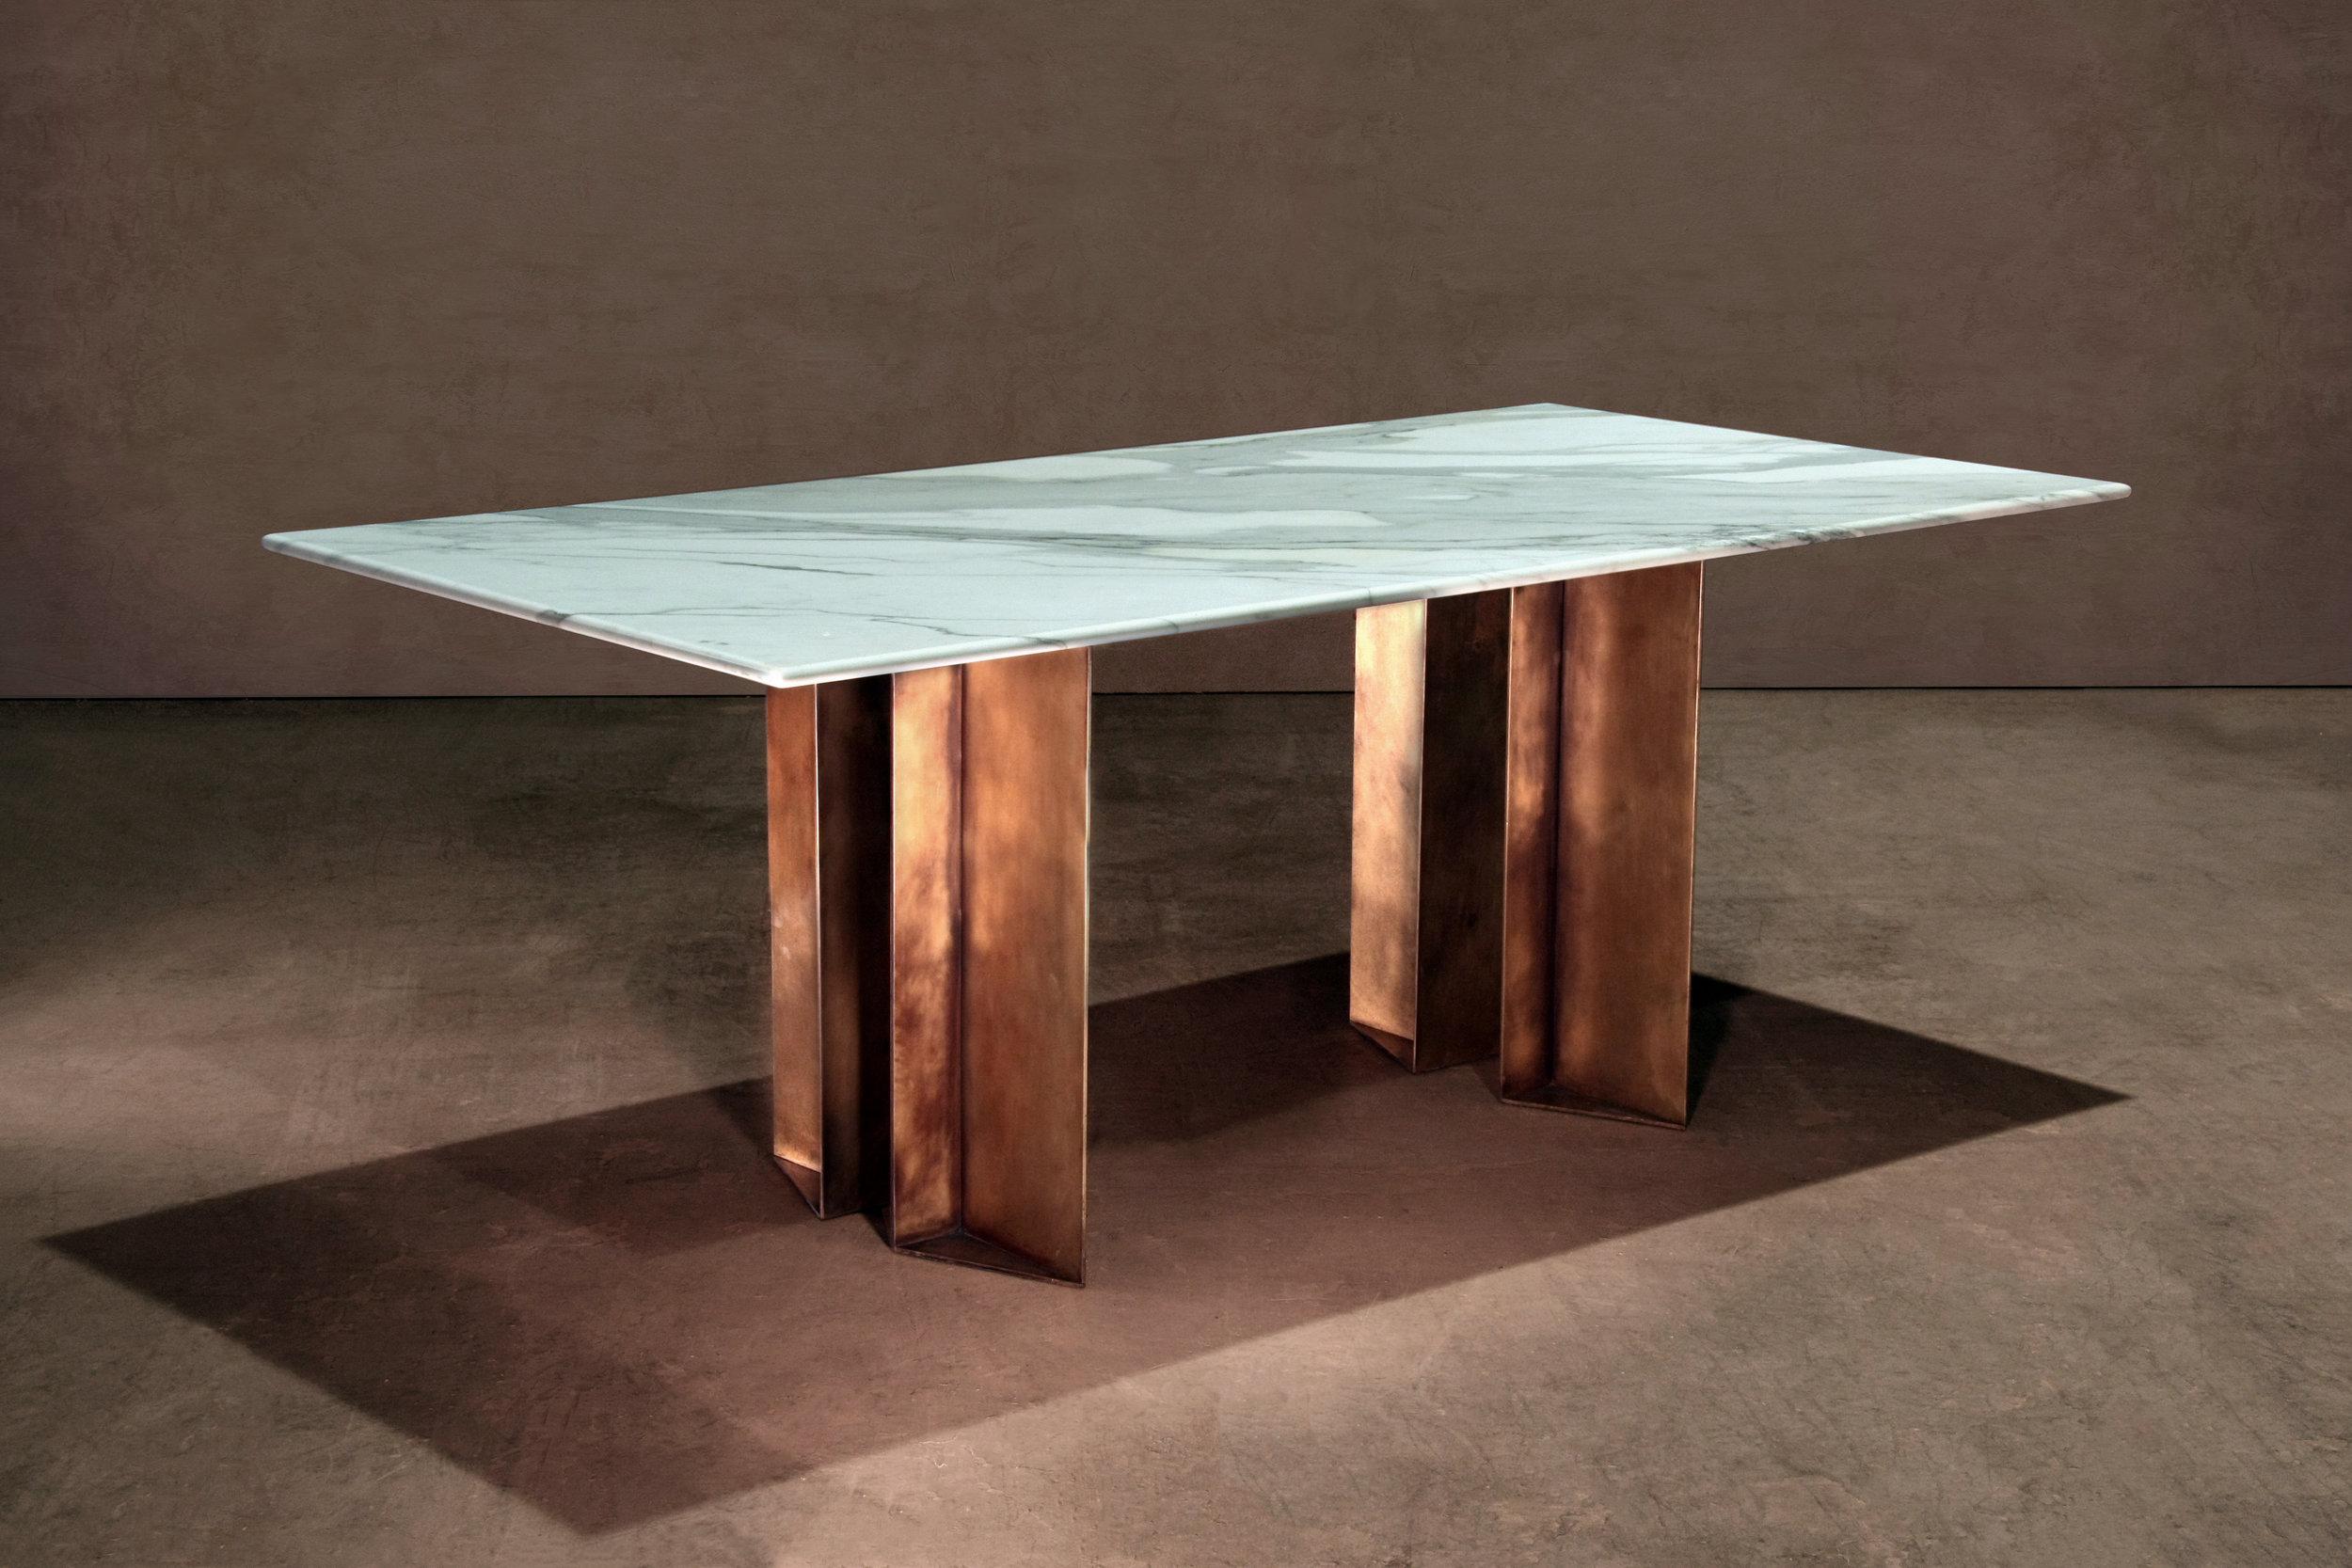 NOVOCASTRIAN_Lind + Almond Dining Table 1.jpg